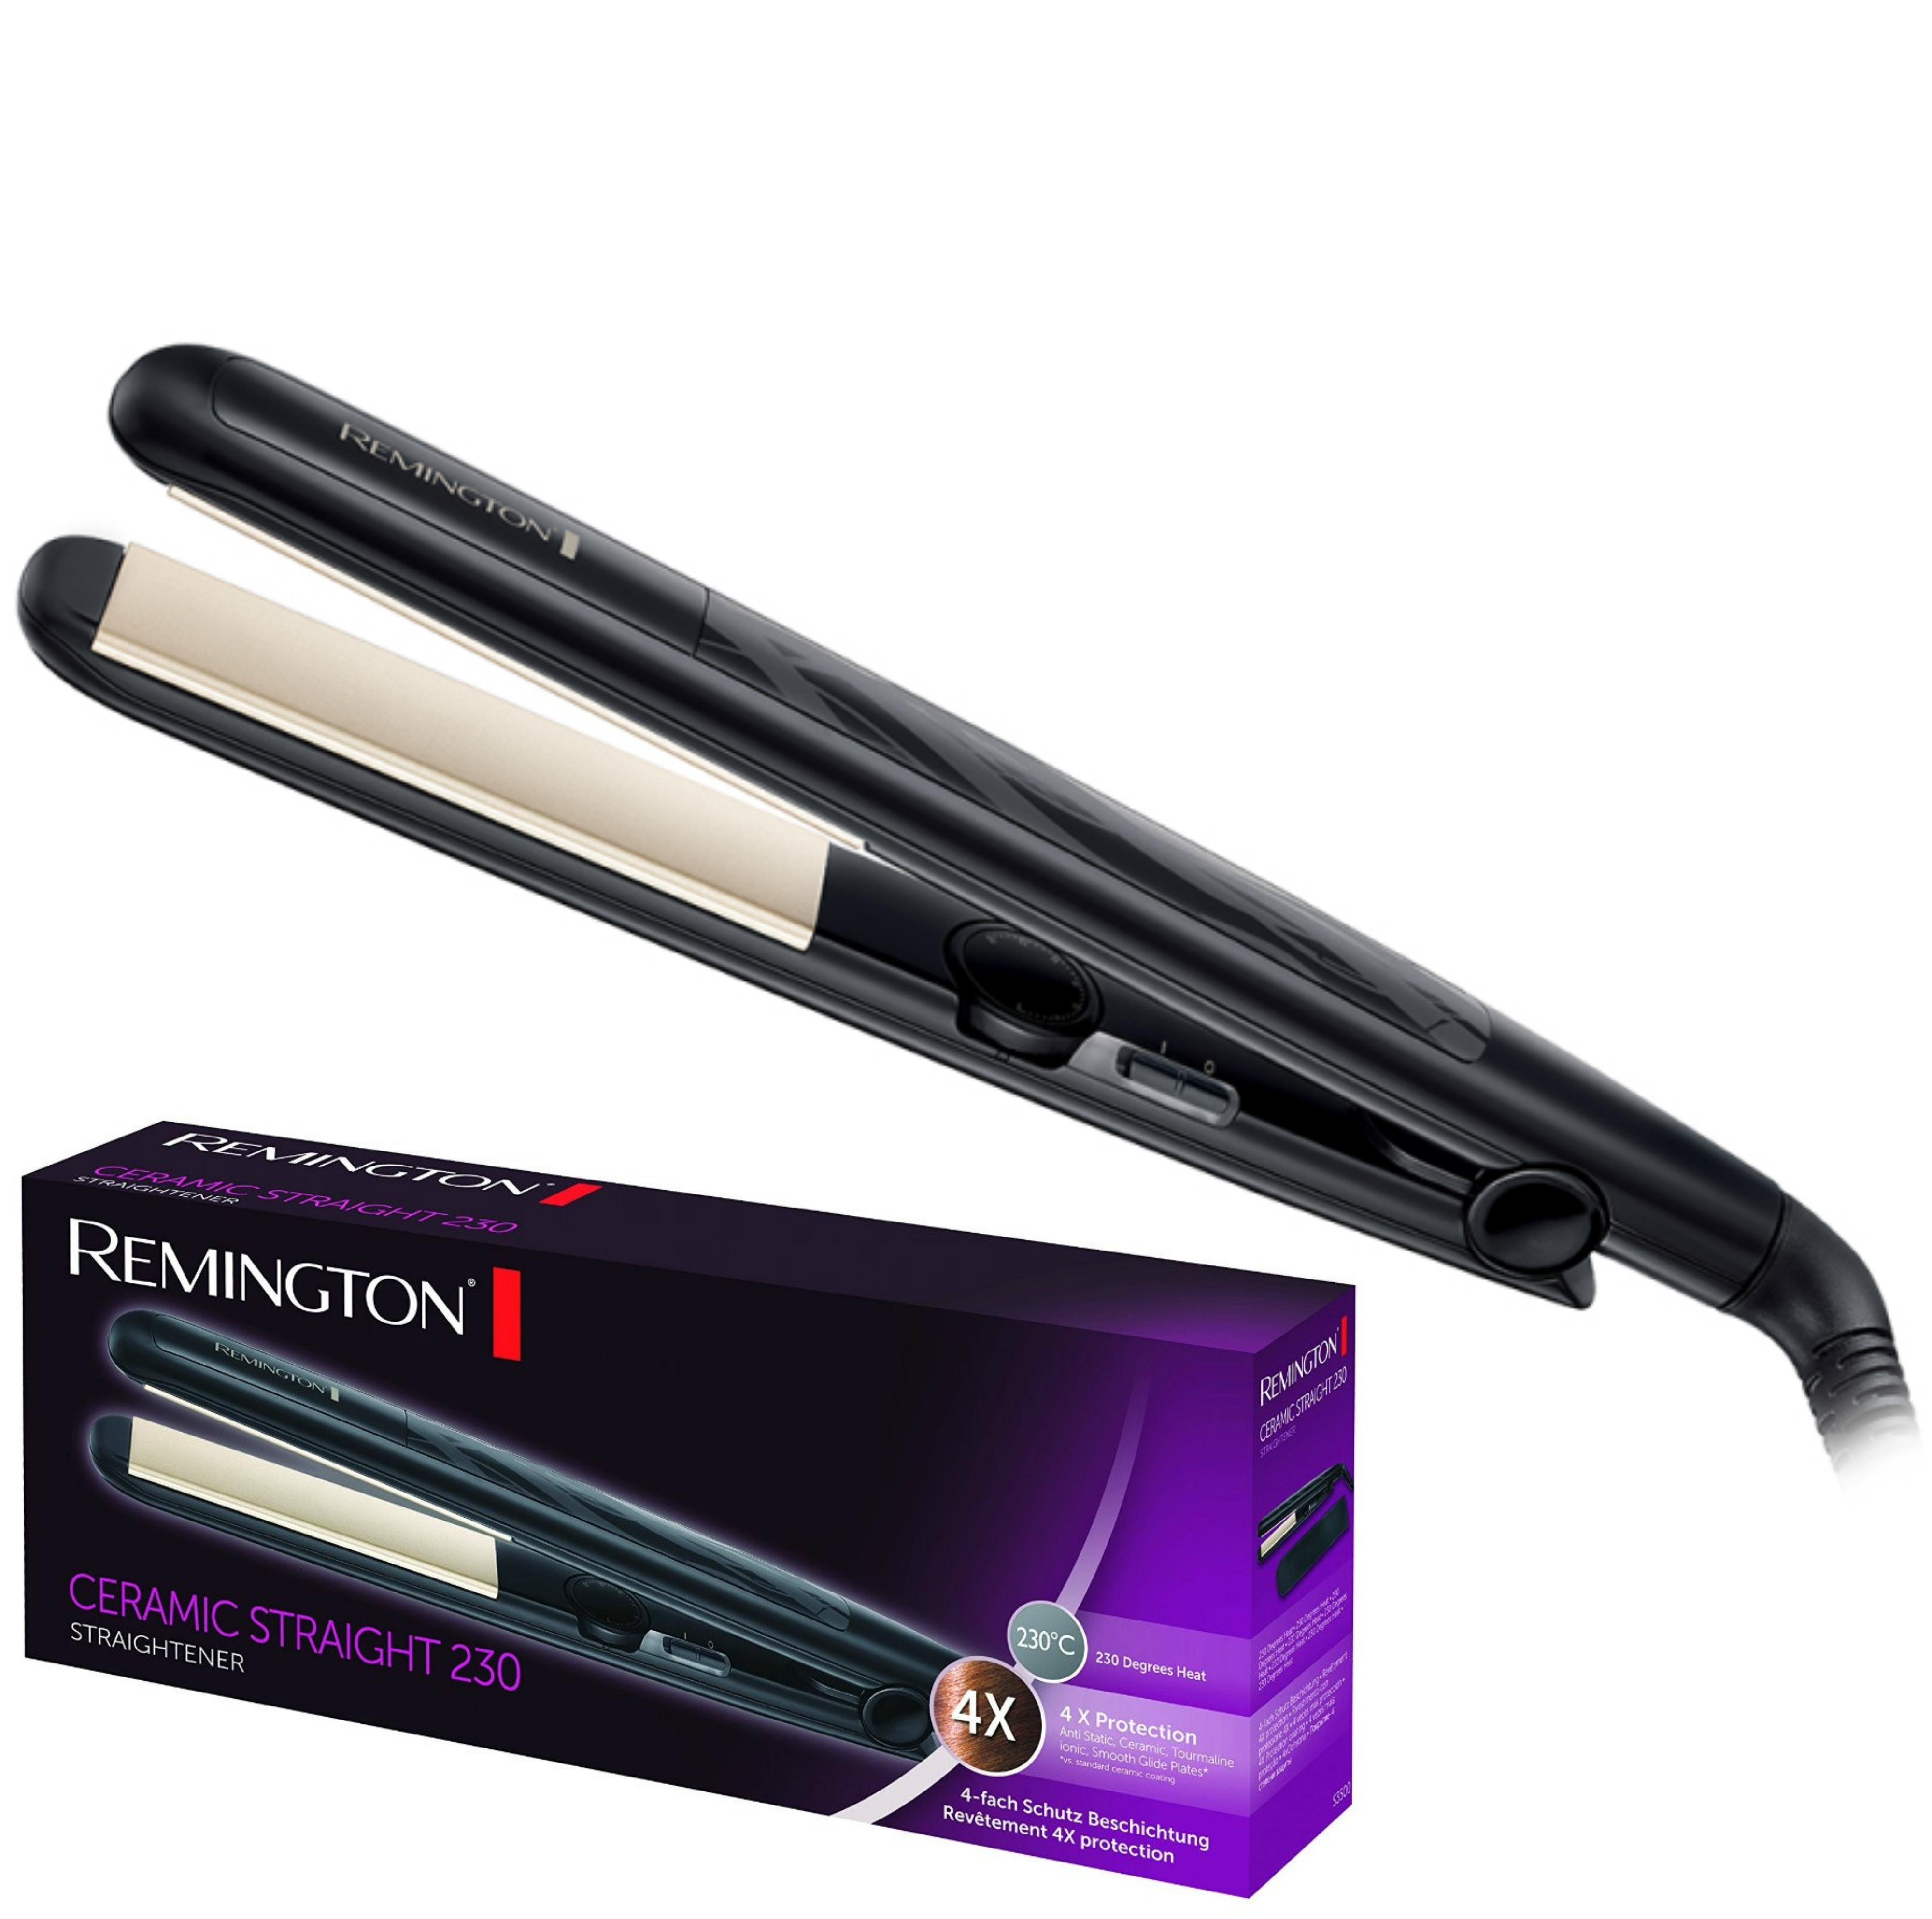 Remington S3500 Ceramic 110mm length 230 Degree Heat Hair Style Straightner